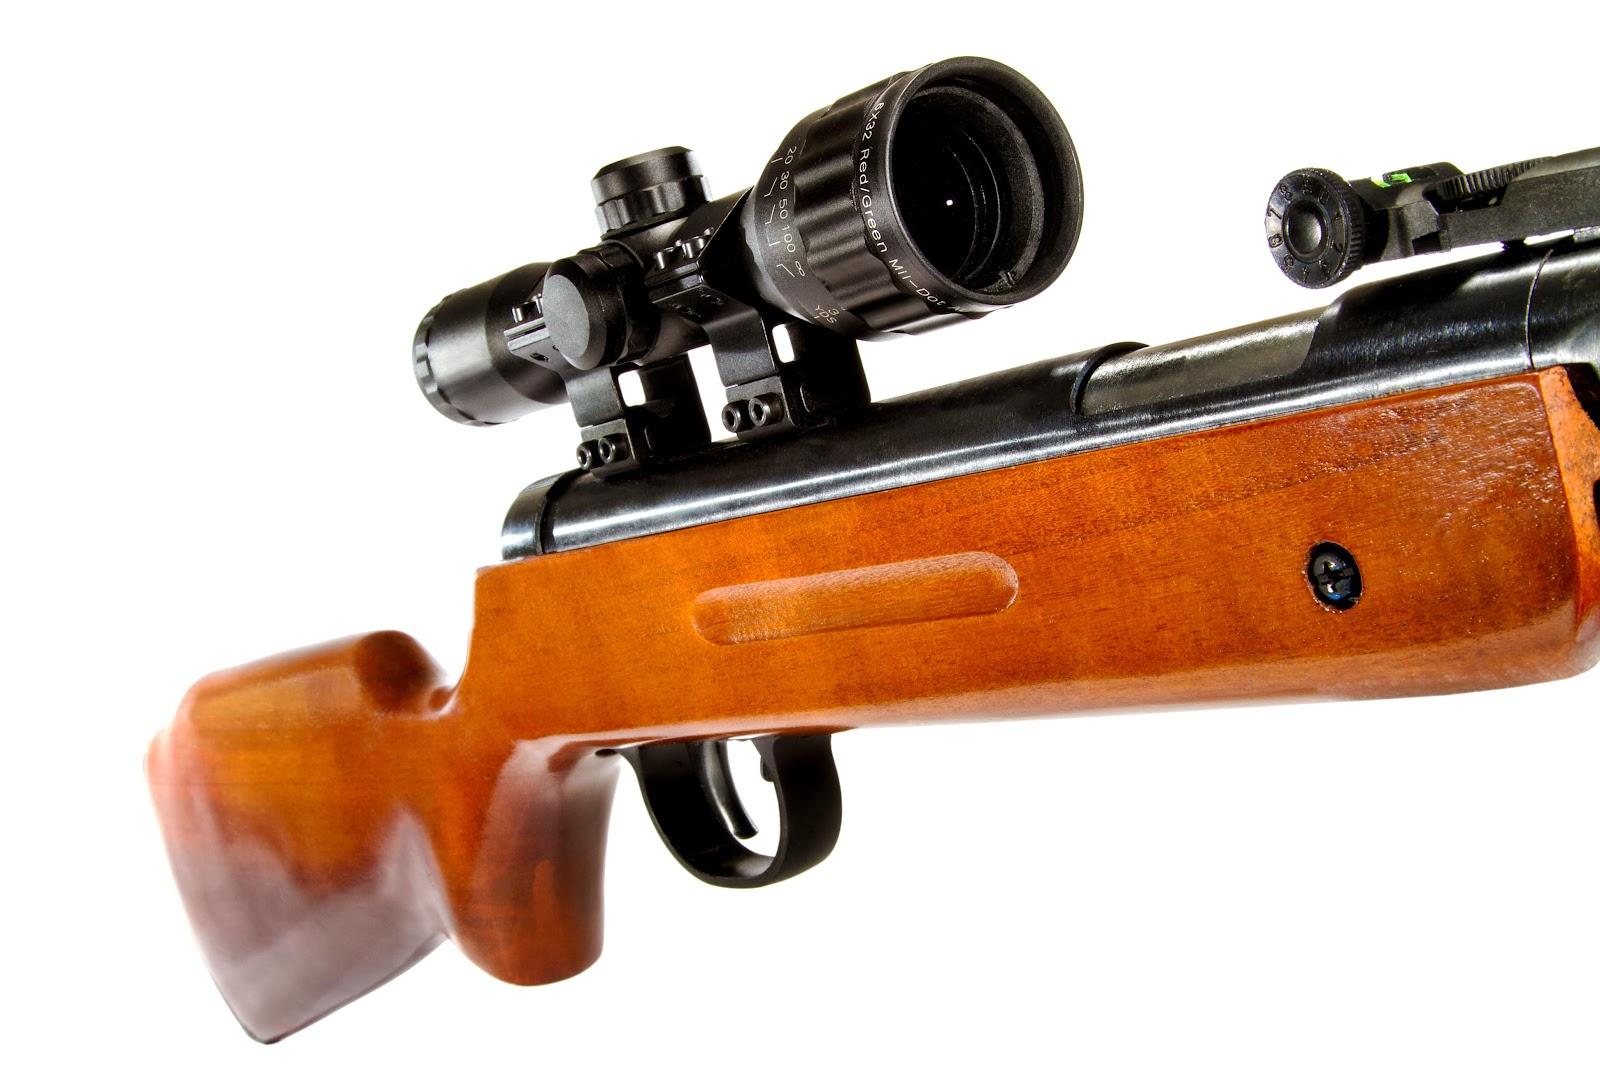 a rifle scope close up image